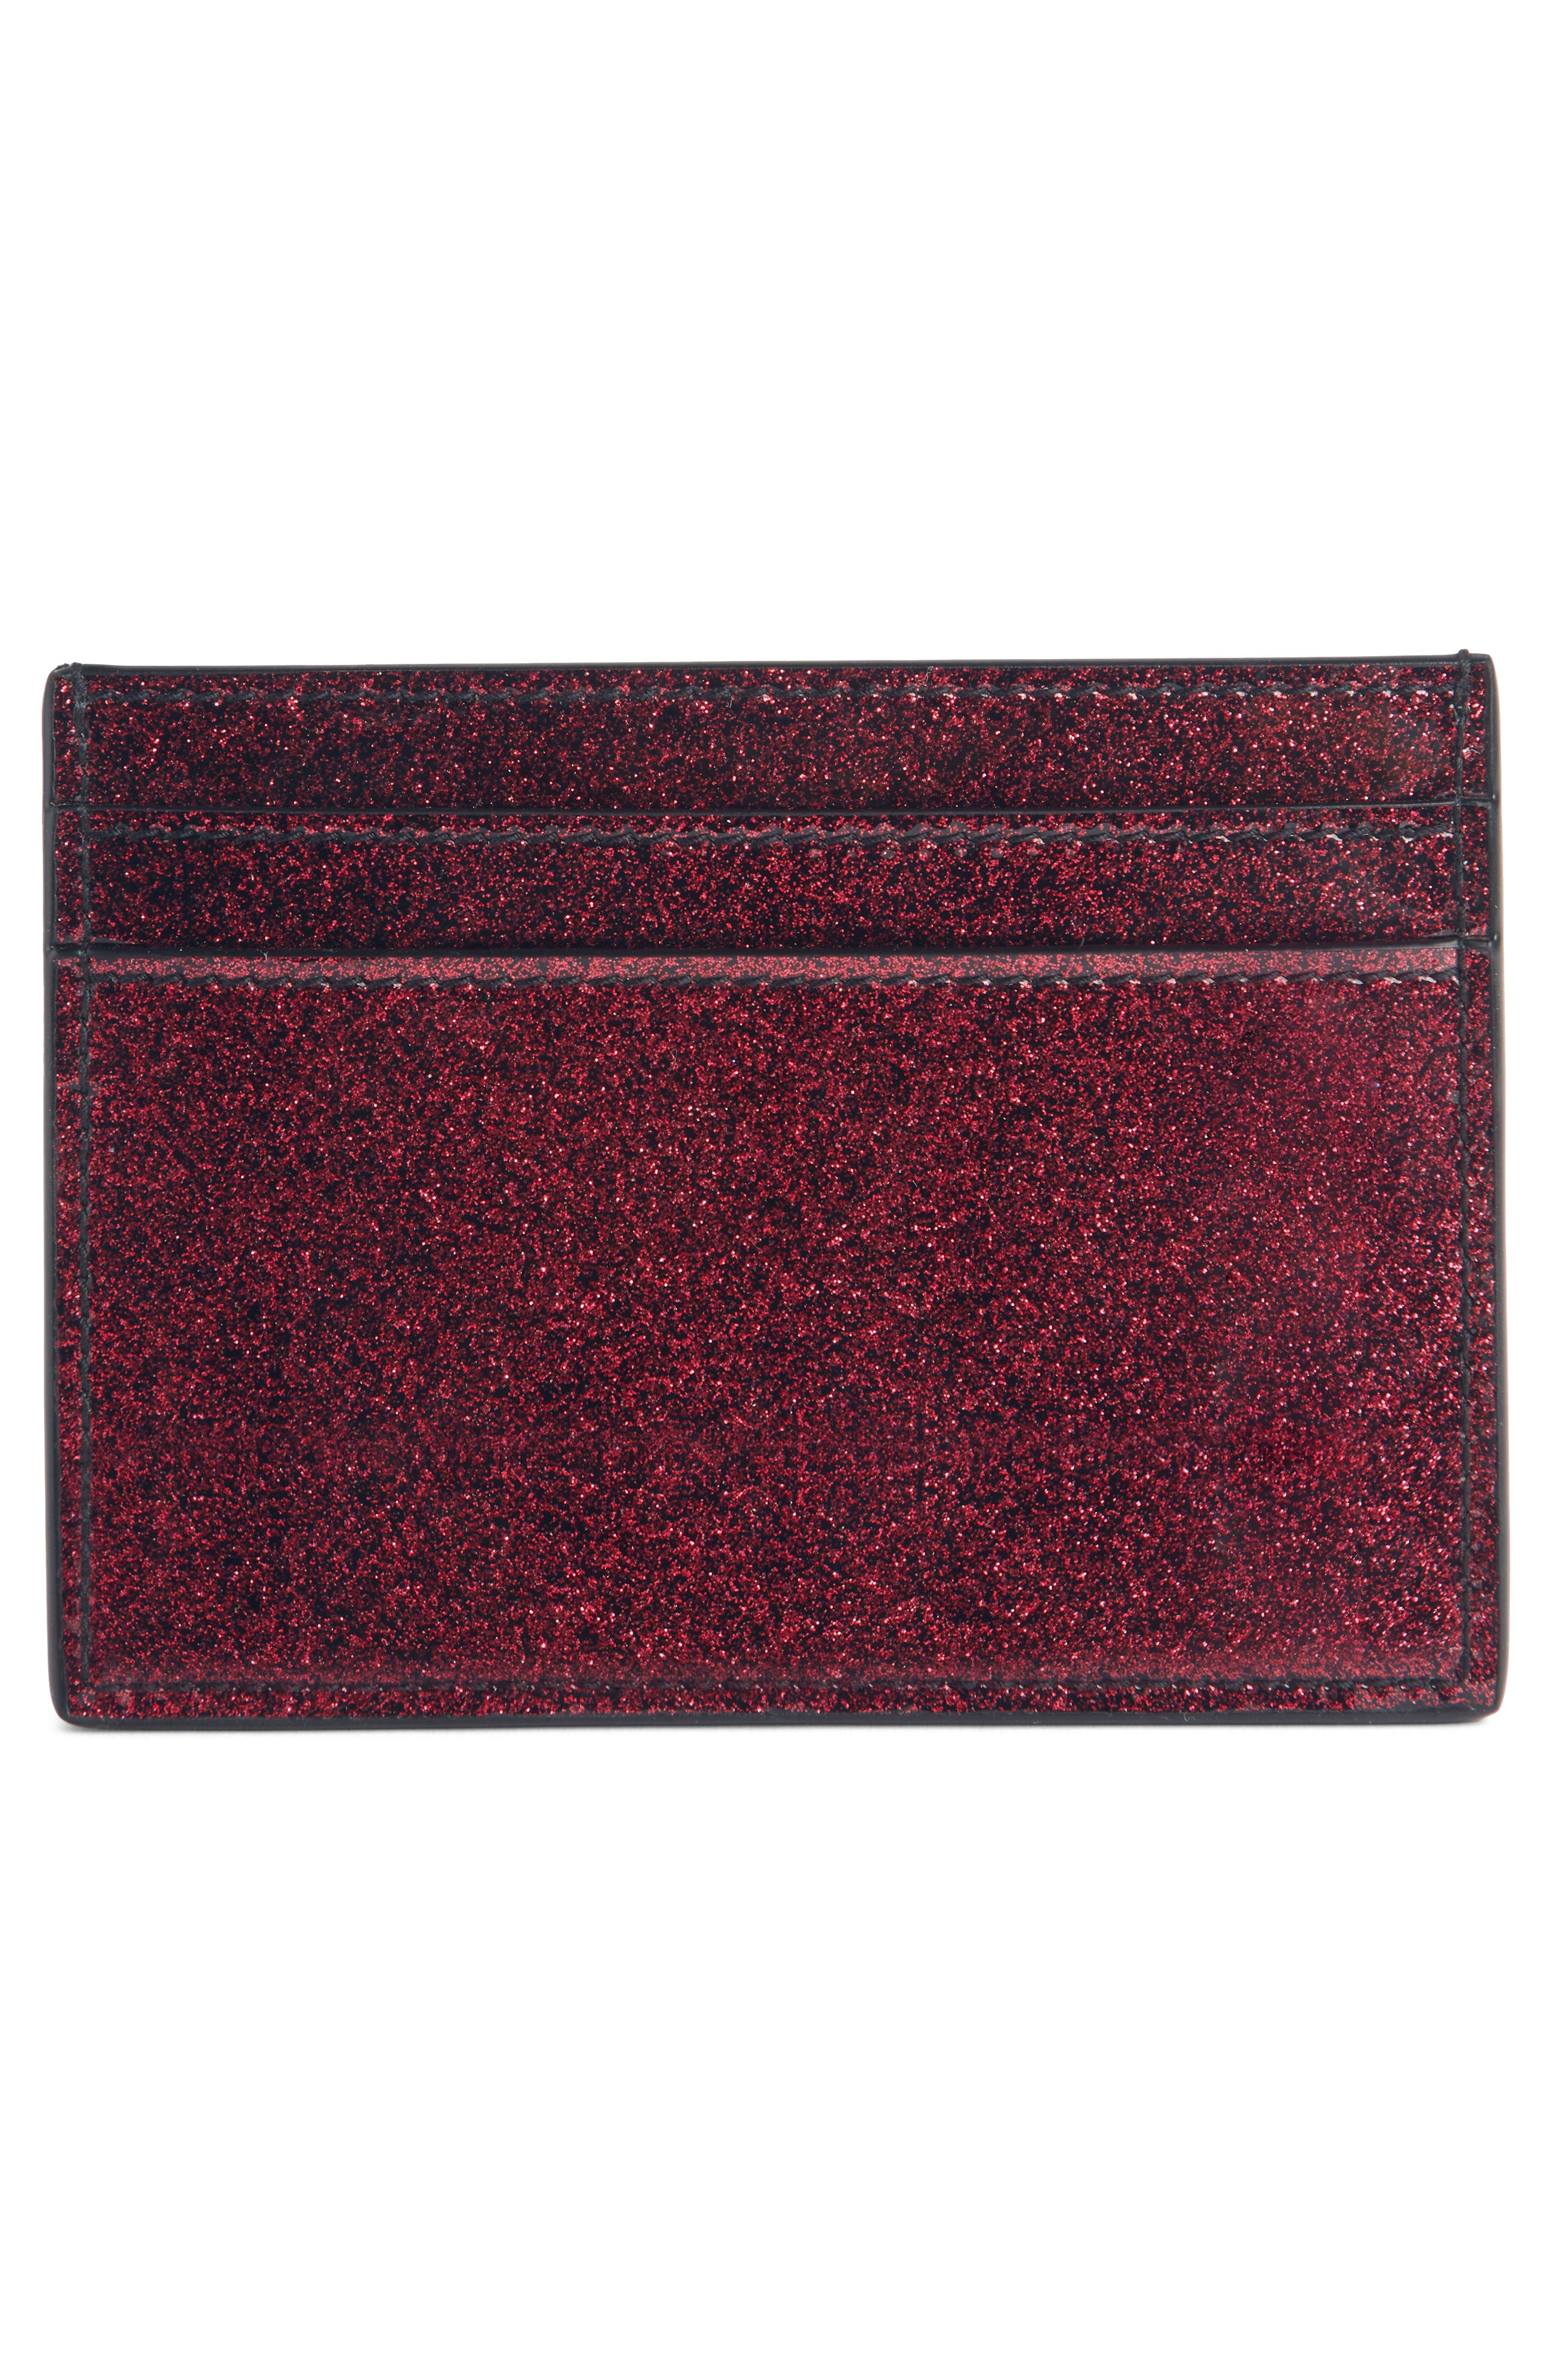 Monogram Vernis Glitter Calfskin Leather Card Case,                             Alternate thumbnail 2, color,                             SHOCKING PINK/ NOIR